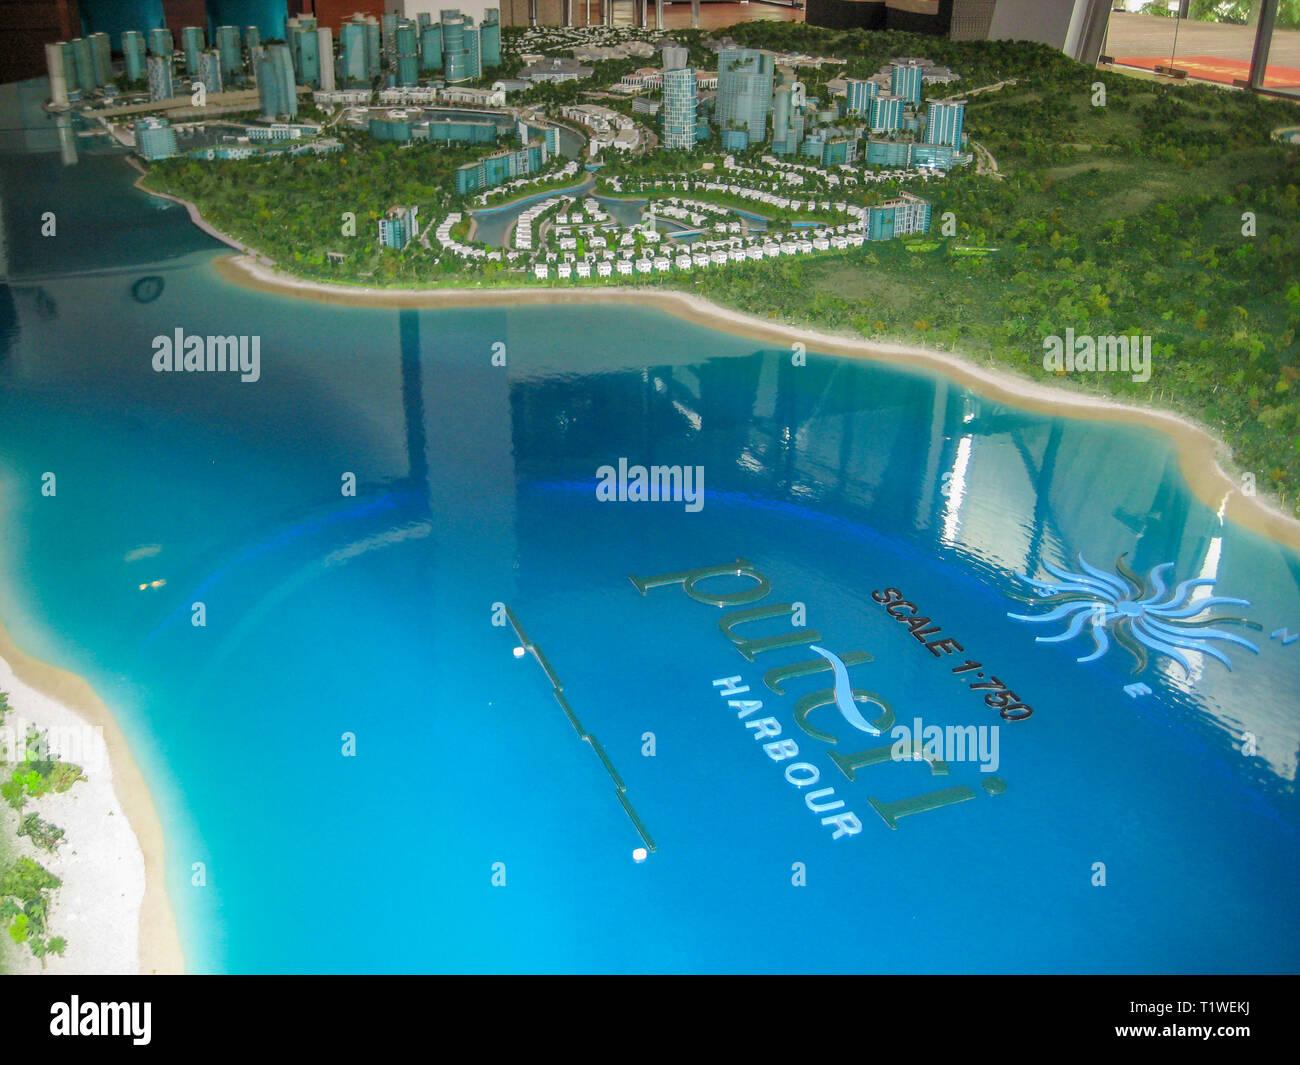 Puteri Harbour masterplan, Iskandar Puteri, Johor, Malaysia - Stock Image